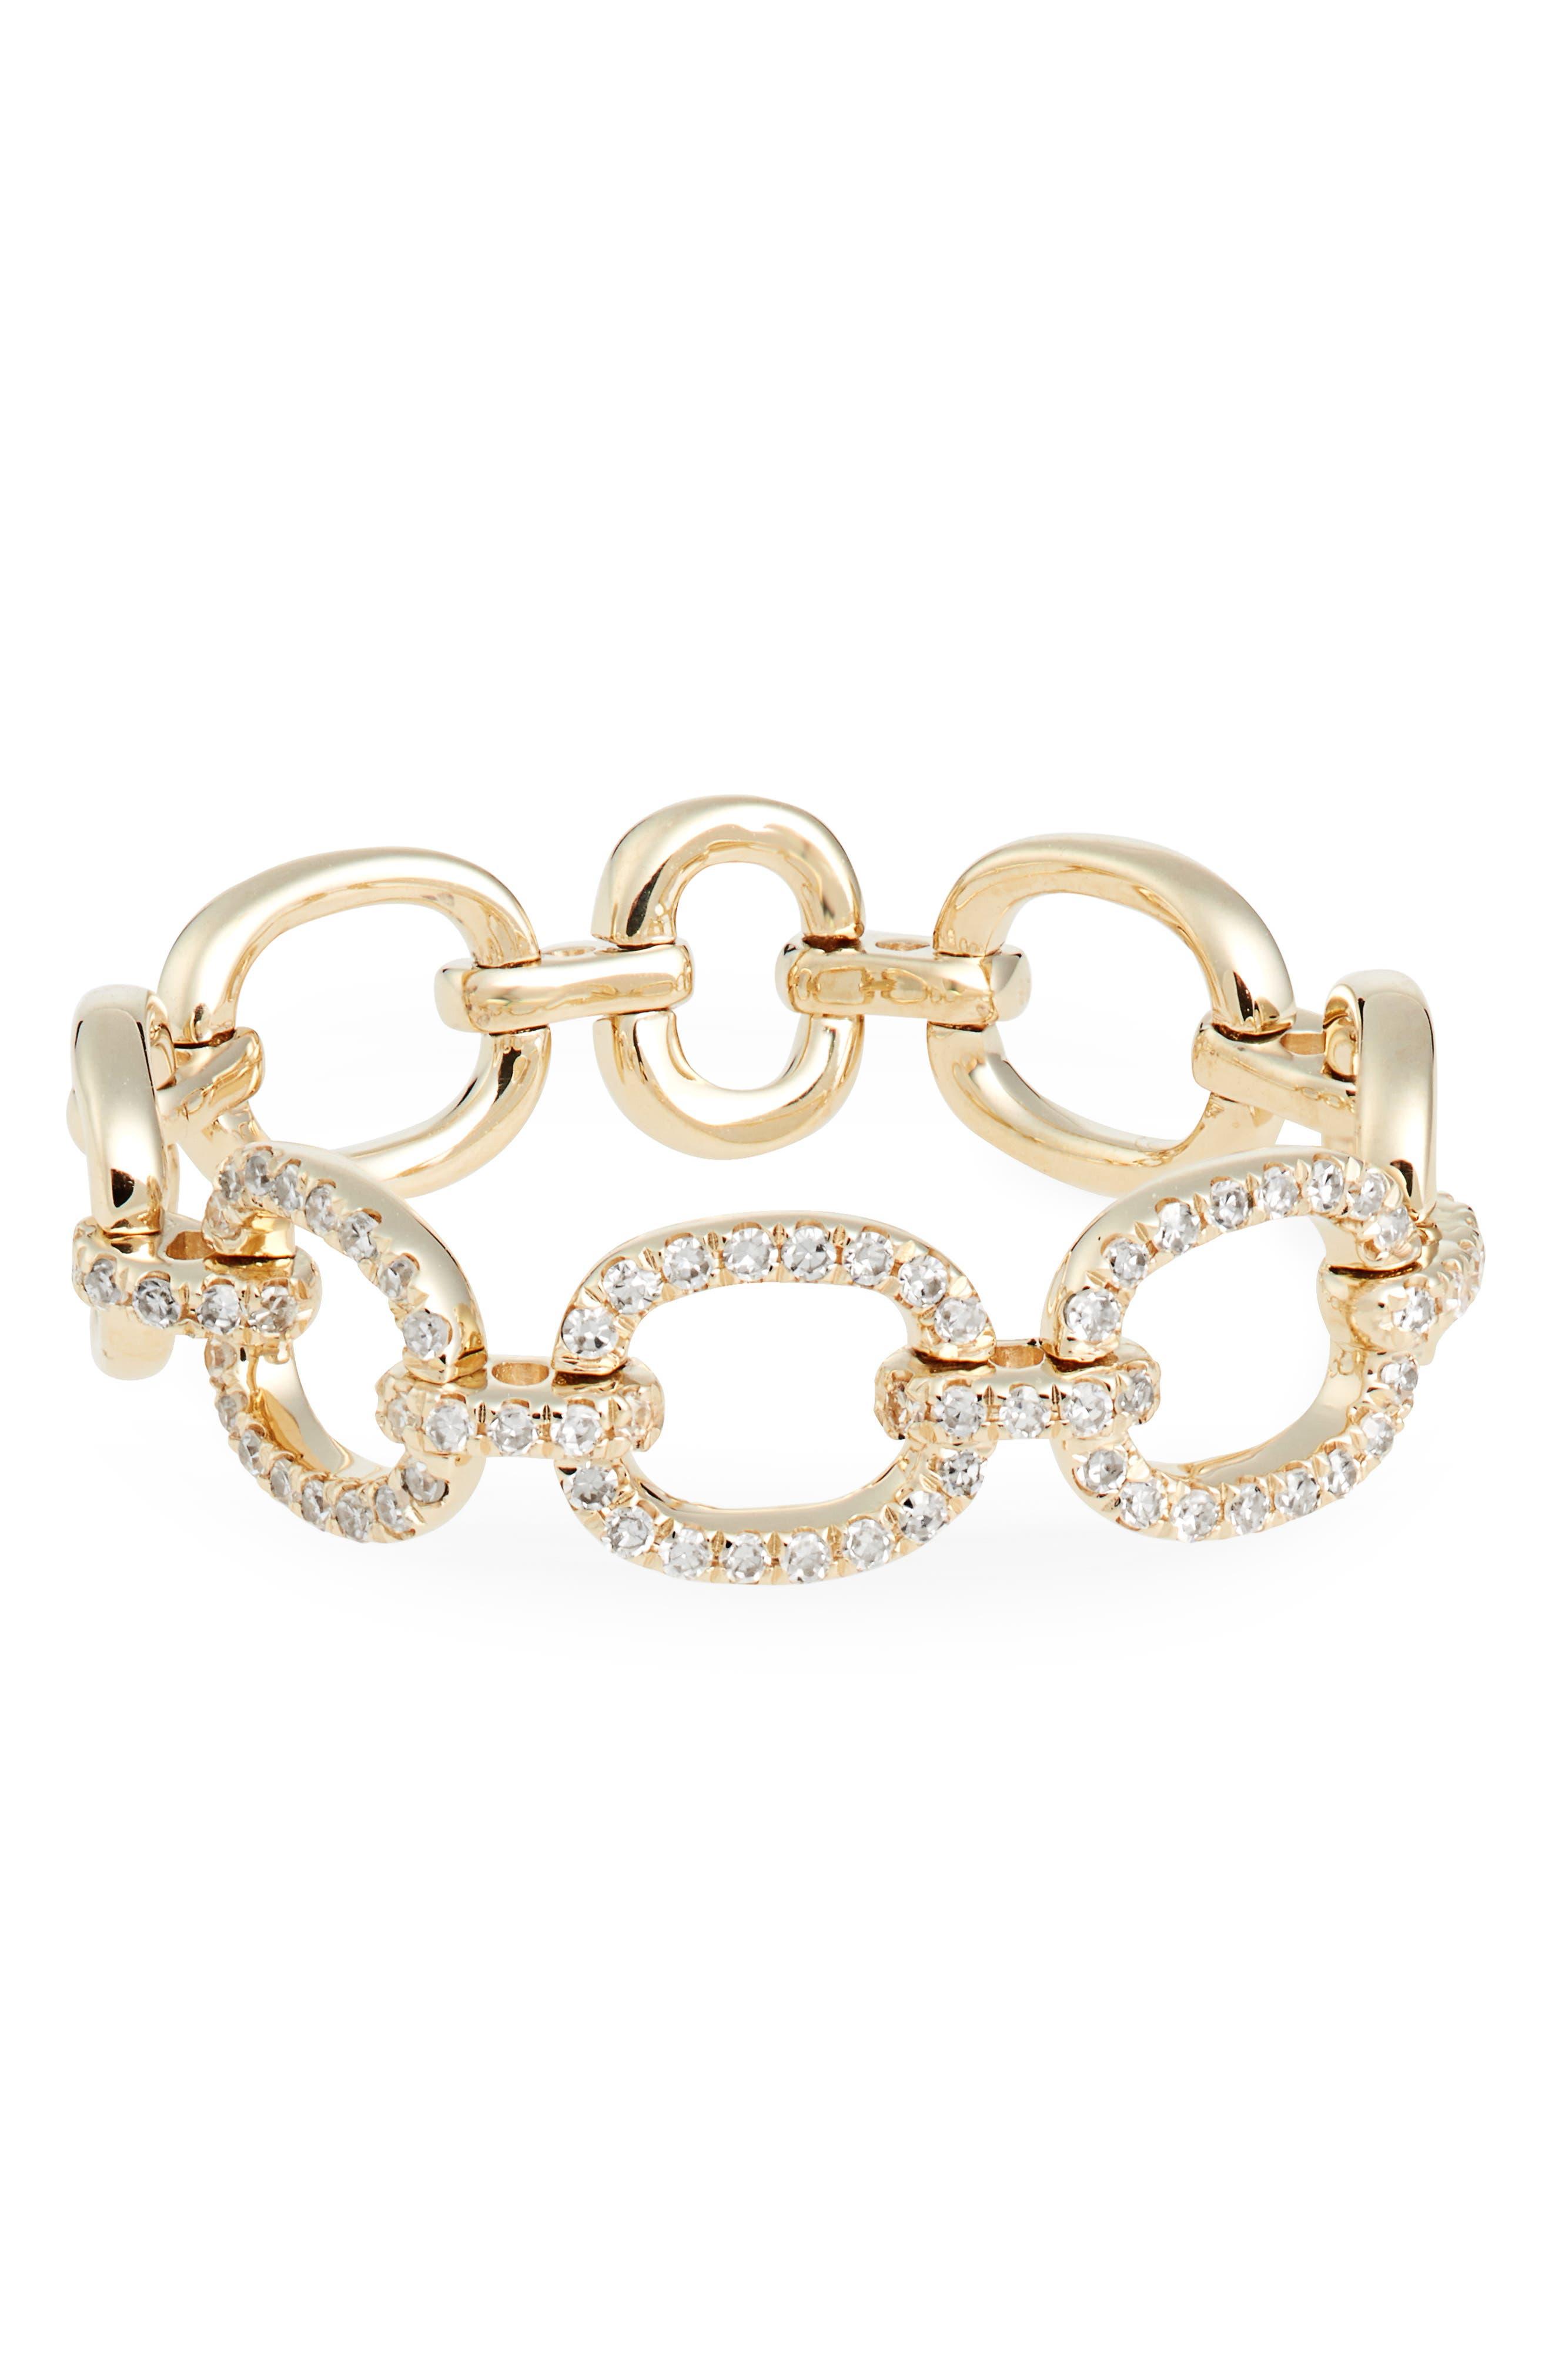 Flexible Chain Link Diamond Ring